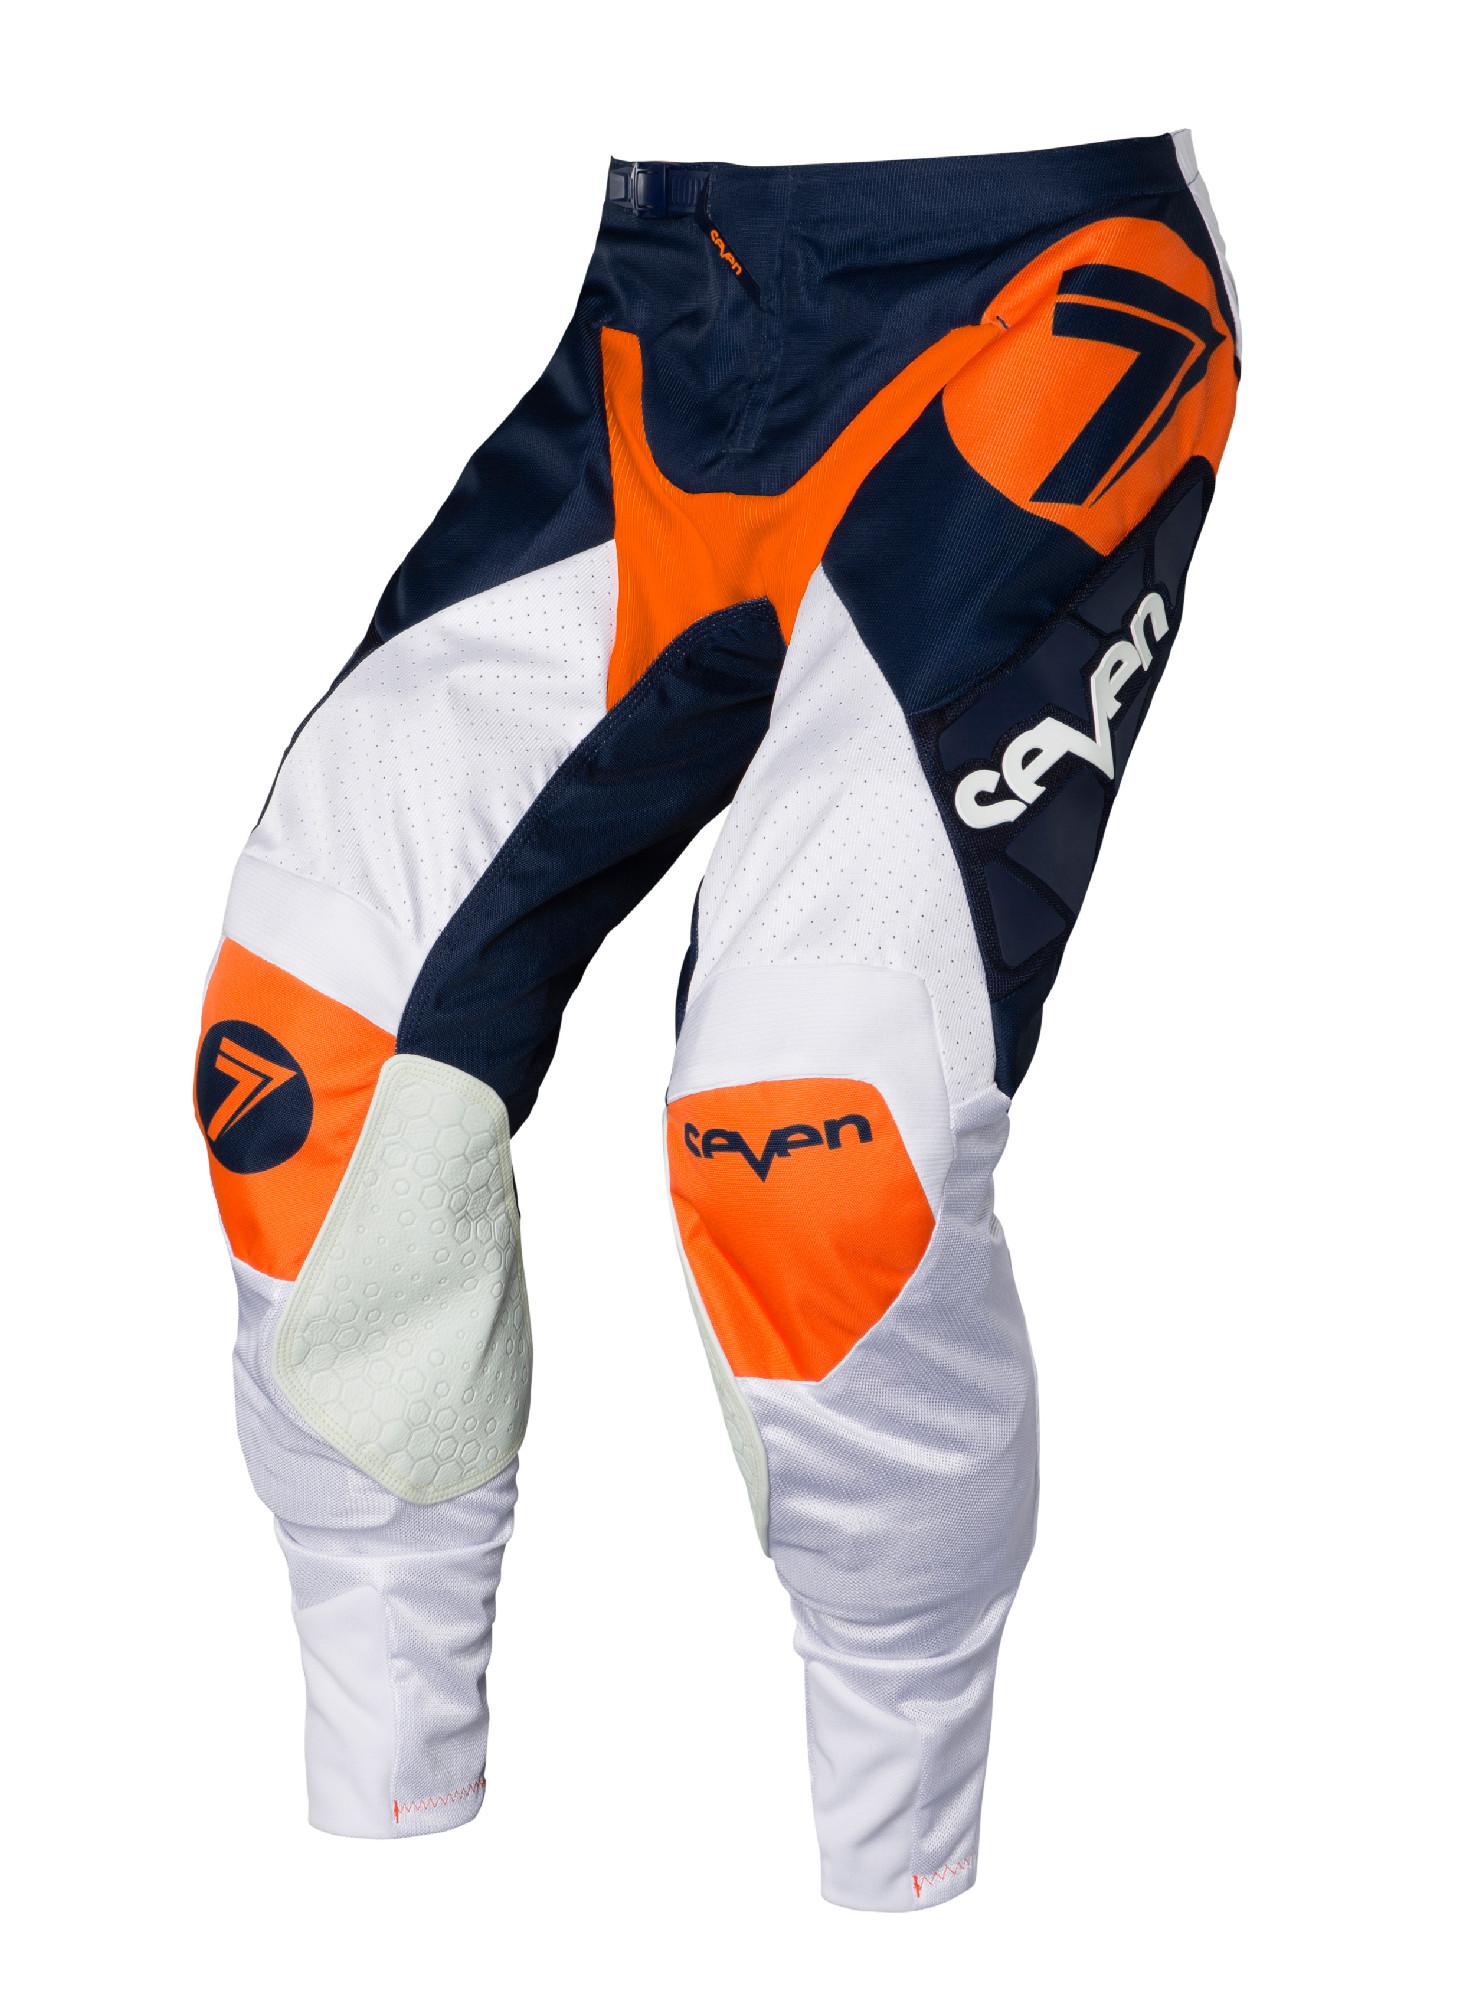 Seven Orange Navy Blue White Mens Rival Zone Dirt Bike Pants ATV BMX ... dc21ac86b